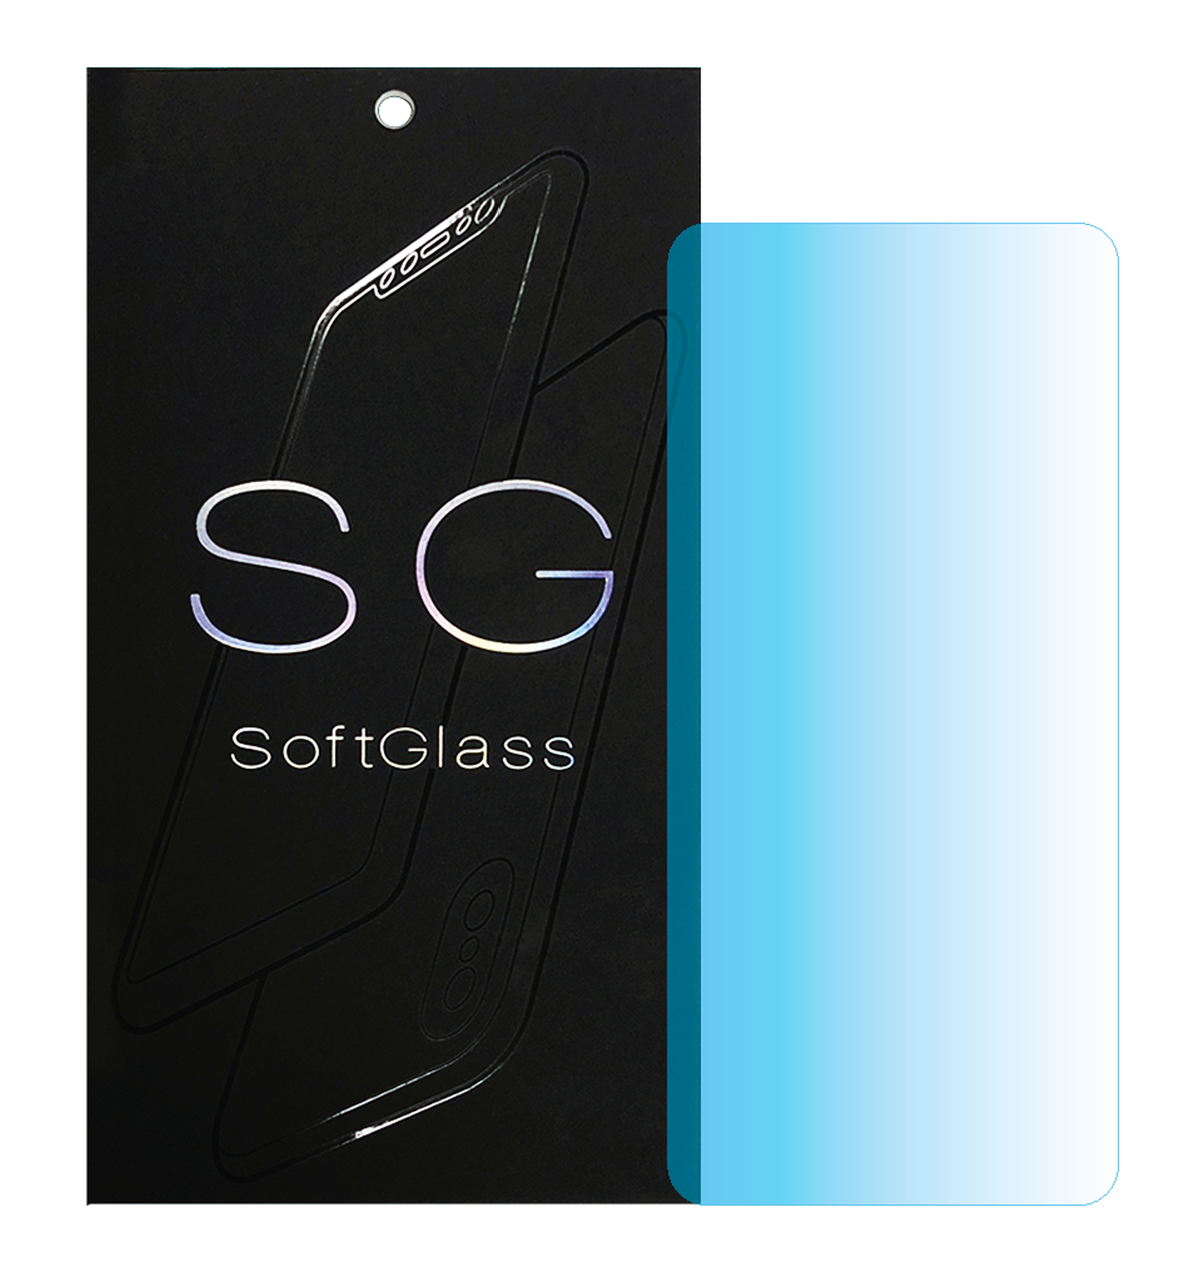 Поліуретанова плівка Huawei PSmart PRO SoftGlass Екран